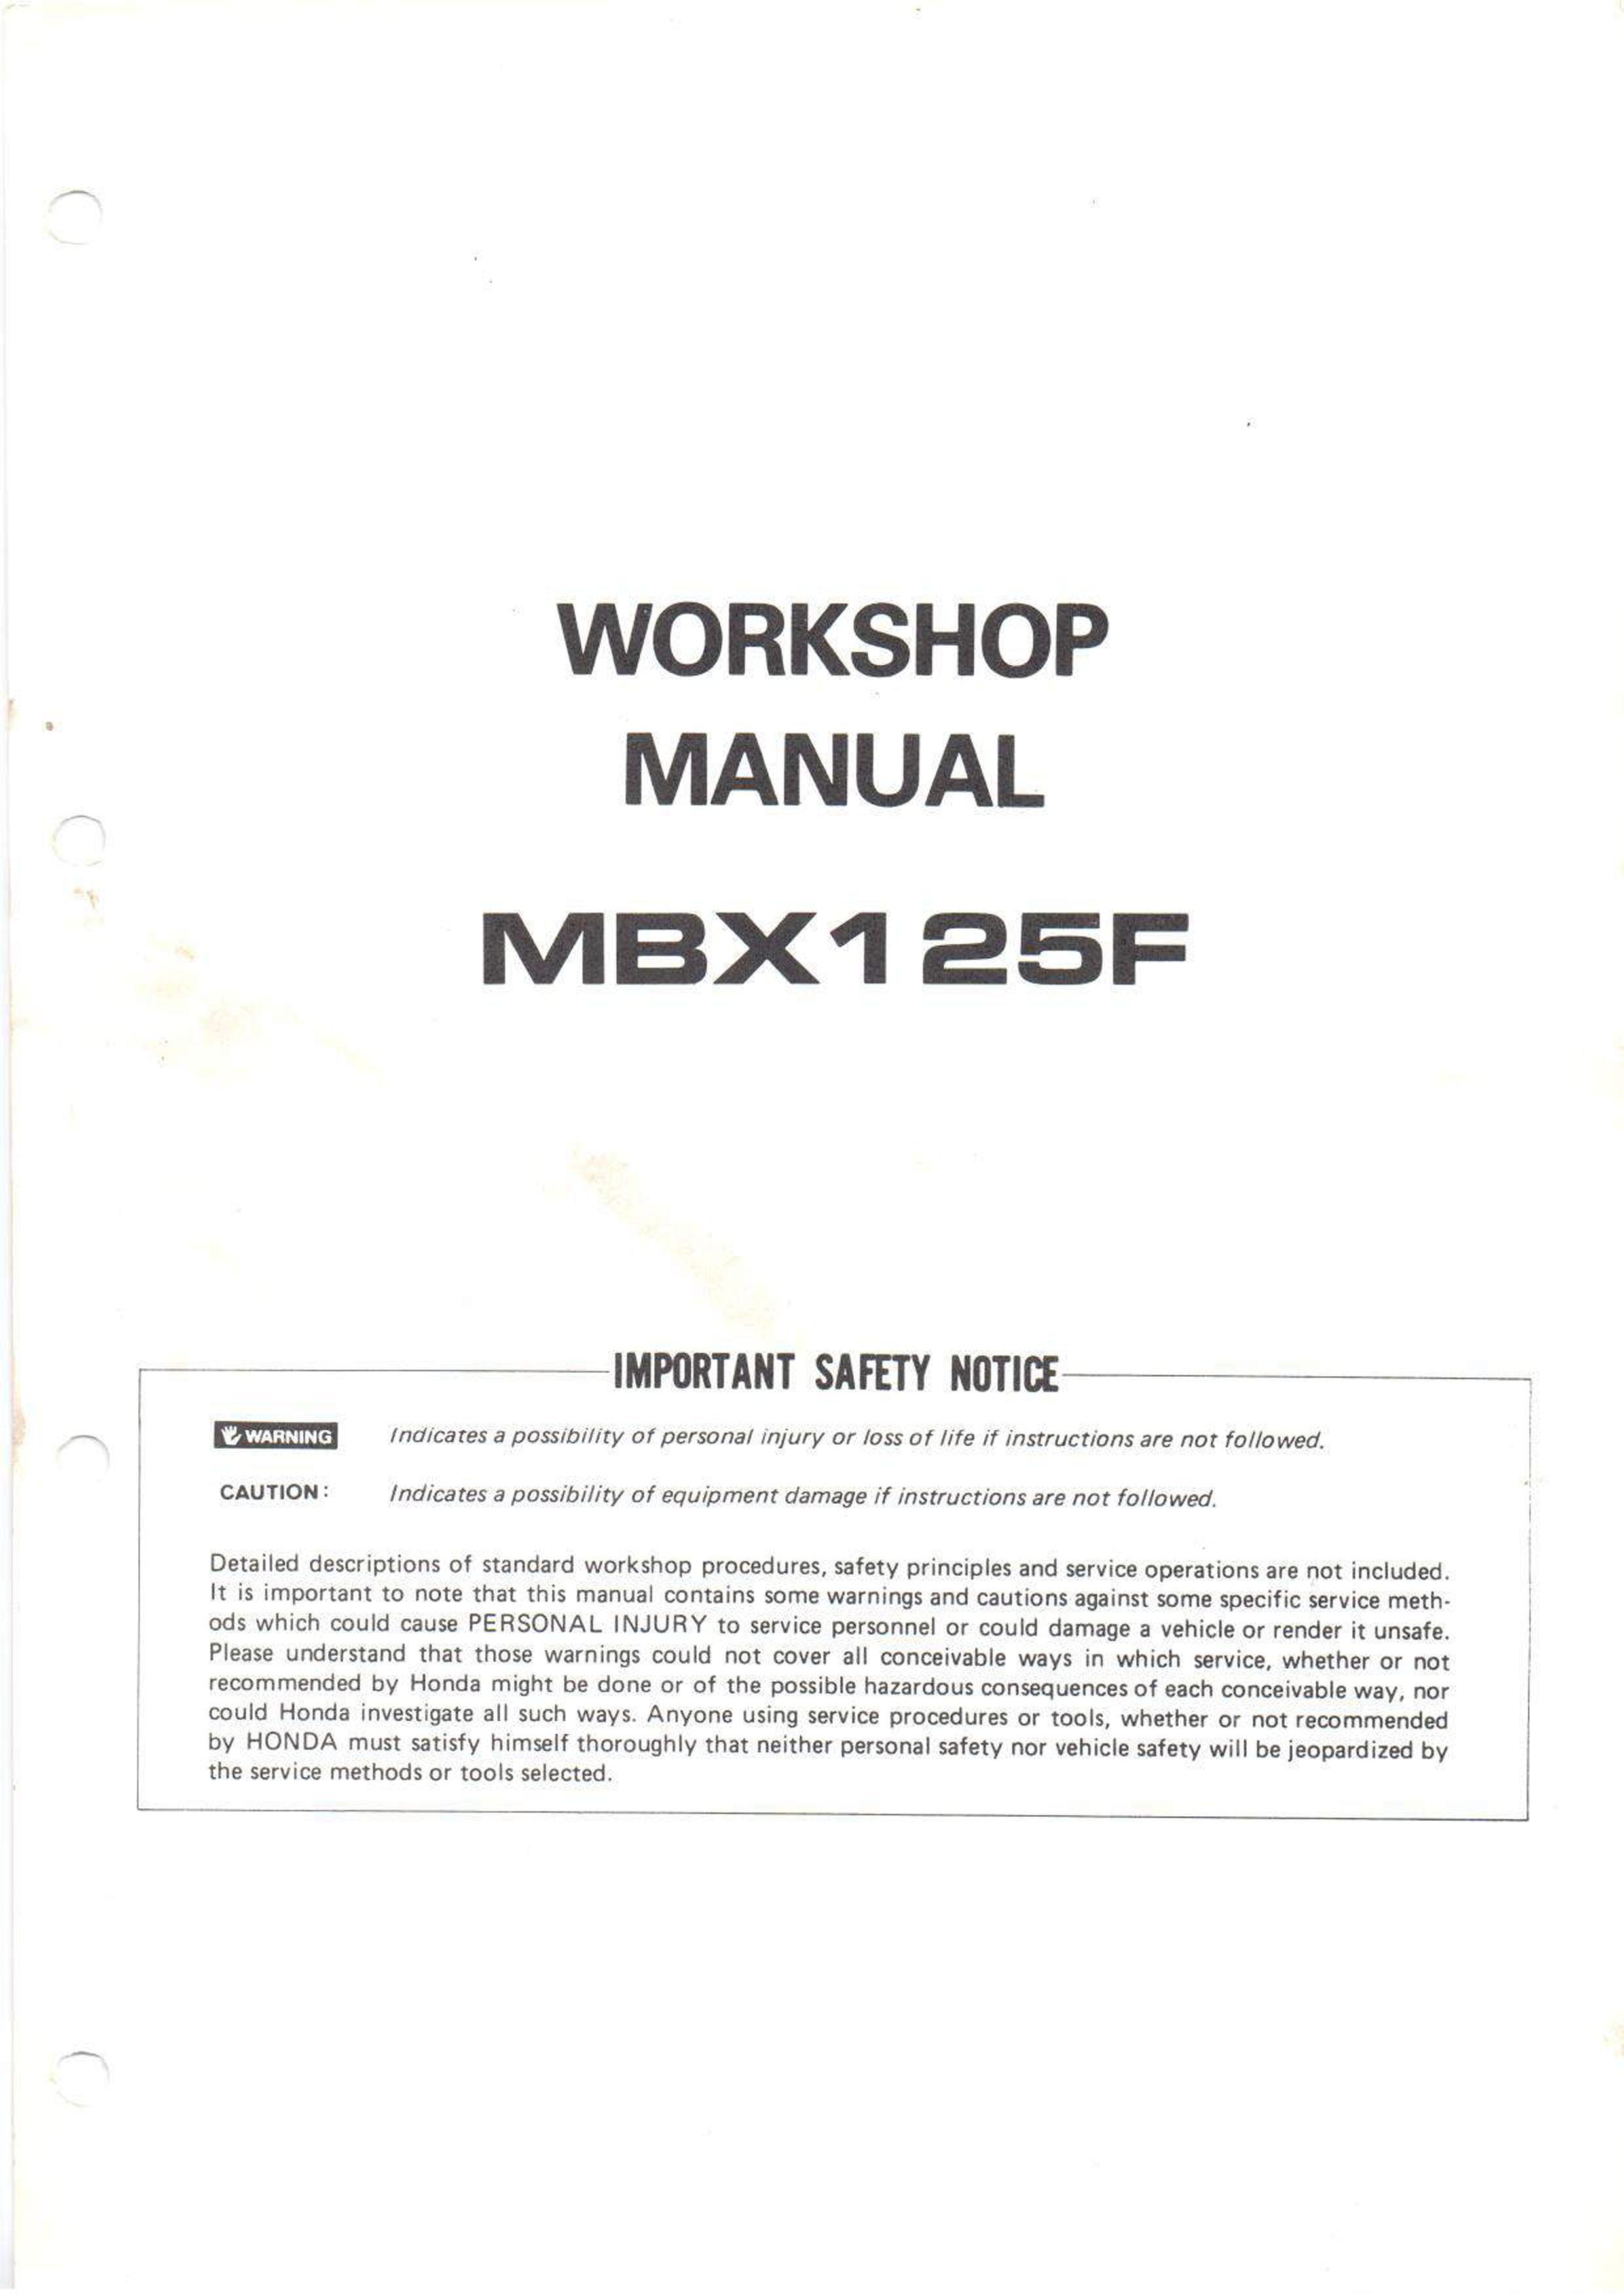 Workshop manual for Honda MBX125F